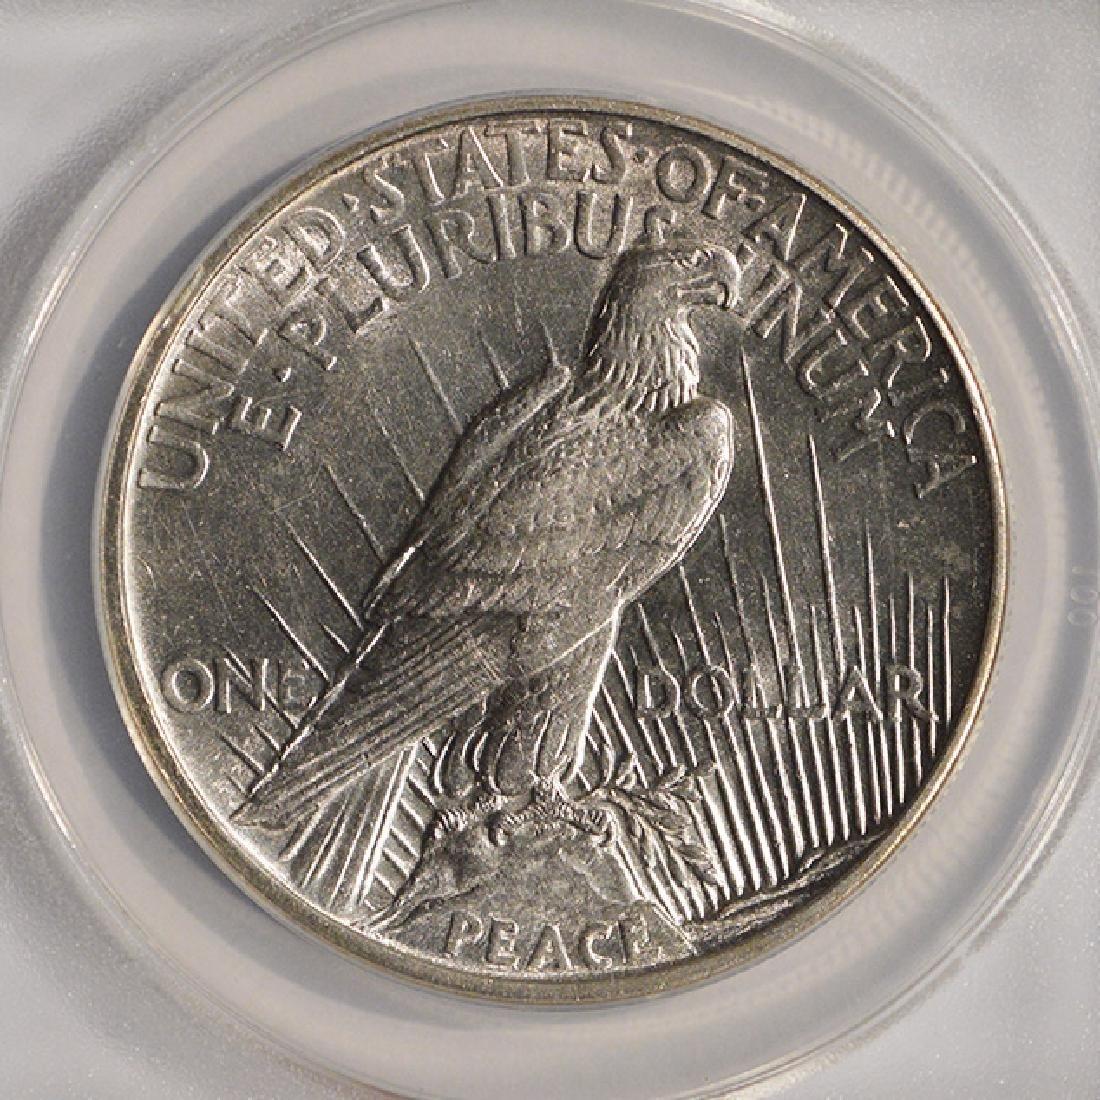 1921 $1 Peace Silver Dollar Coin ANACS AU58 - 4